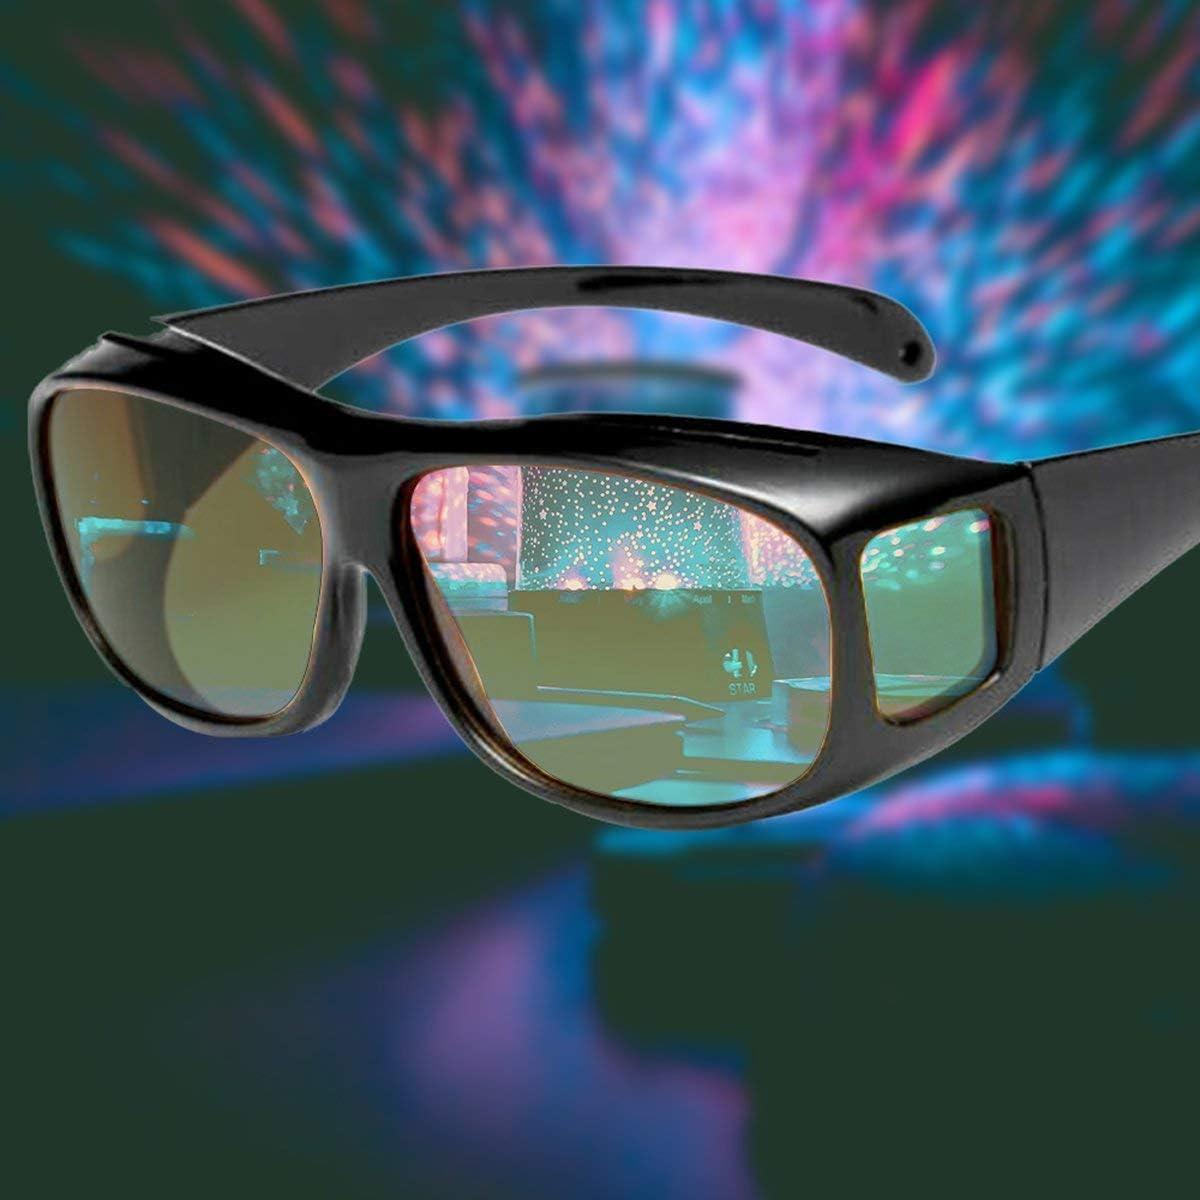 Unisex Sun Glasses Car Driving Glasses Polarized Sunglasses Eyewear UV Protection Night Vision Goggles